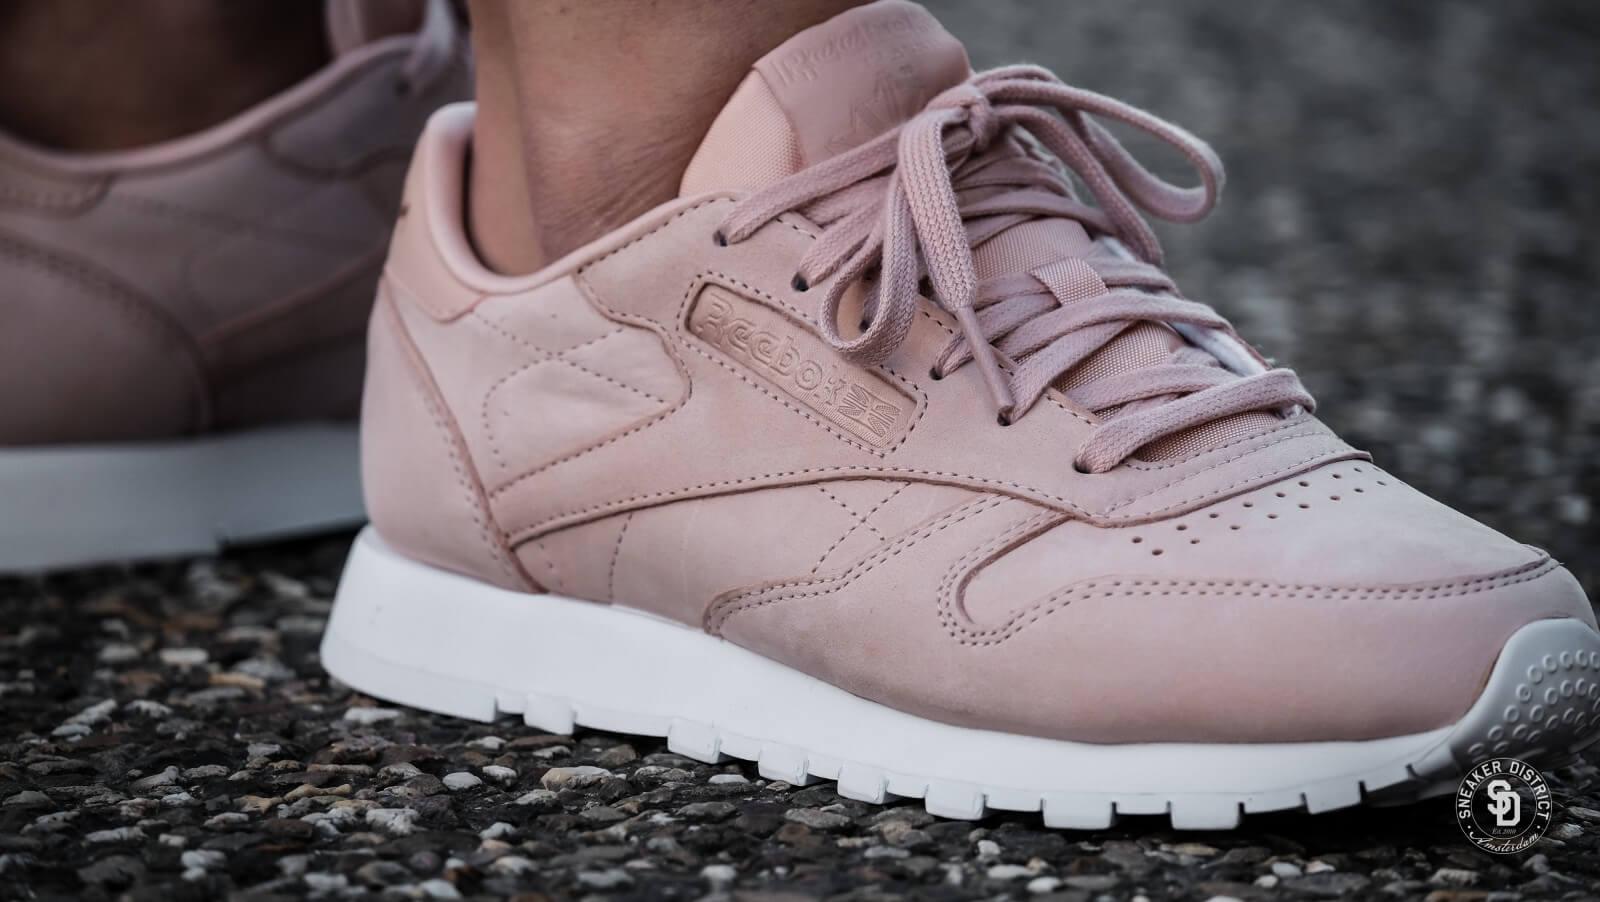 Reebok Classic Nubuck Leather Sneakers In Pink